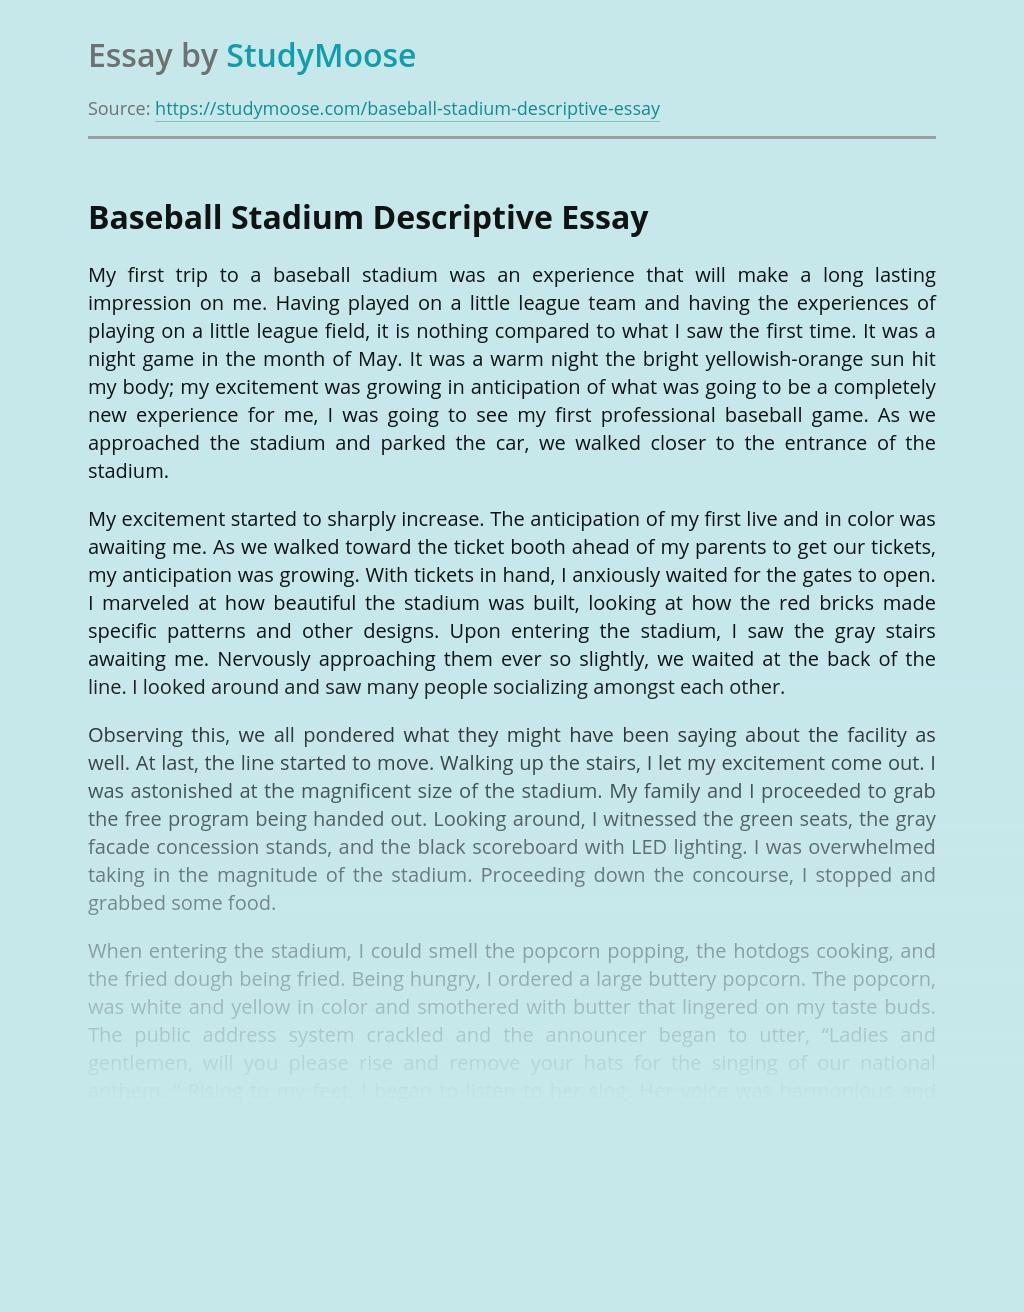 Baseball Stadium Descriptive